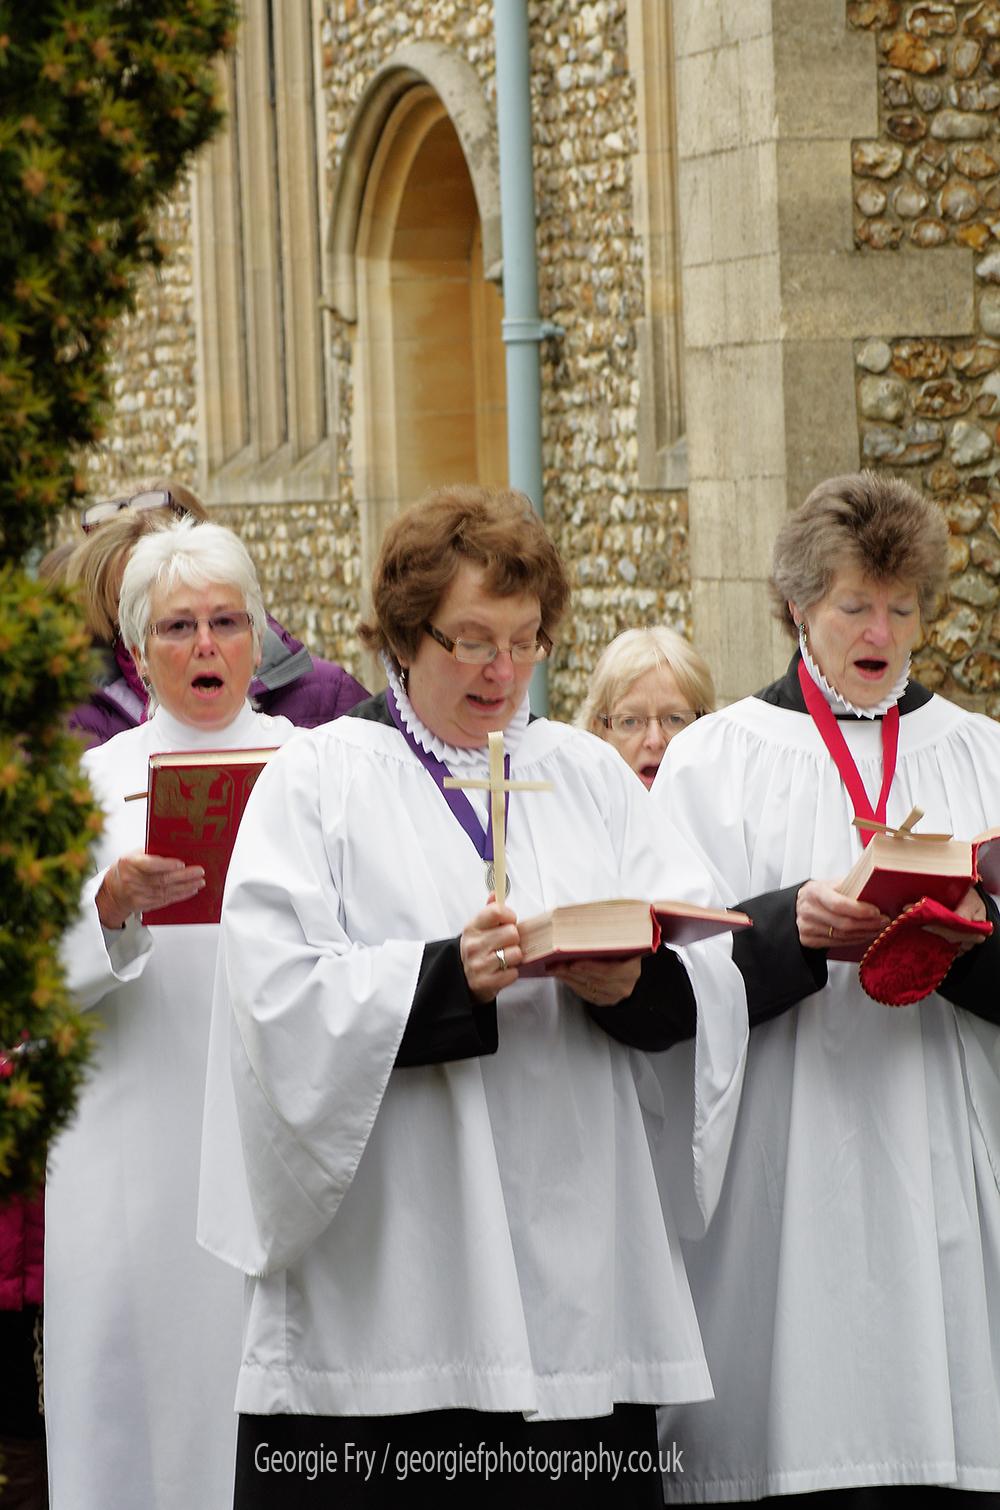 St George's Choir   The Parish of Badshot Lea and Hale